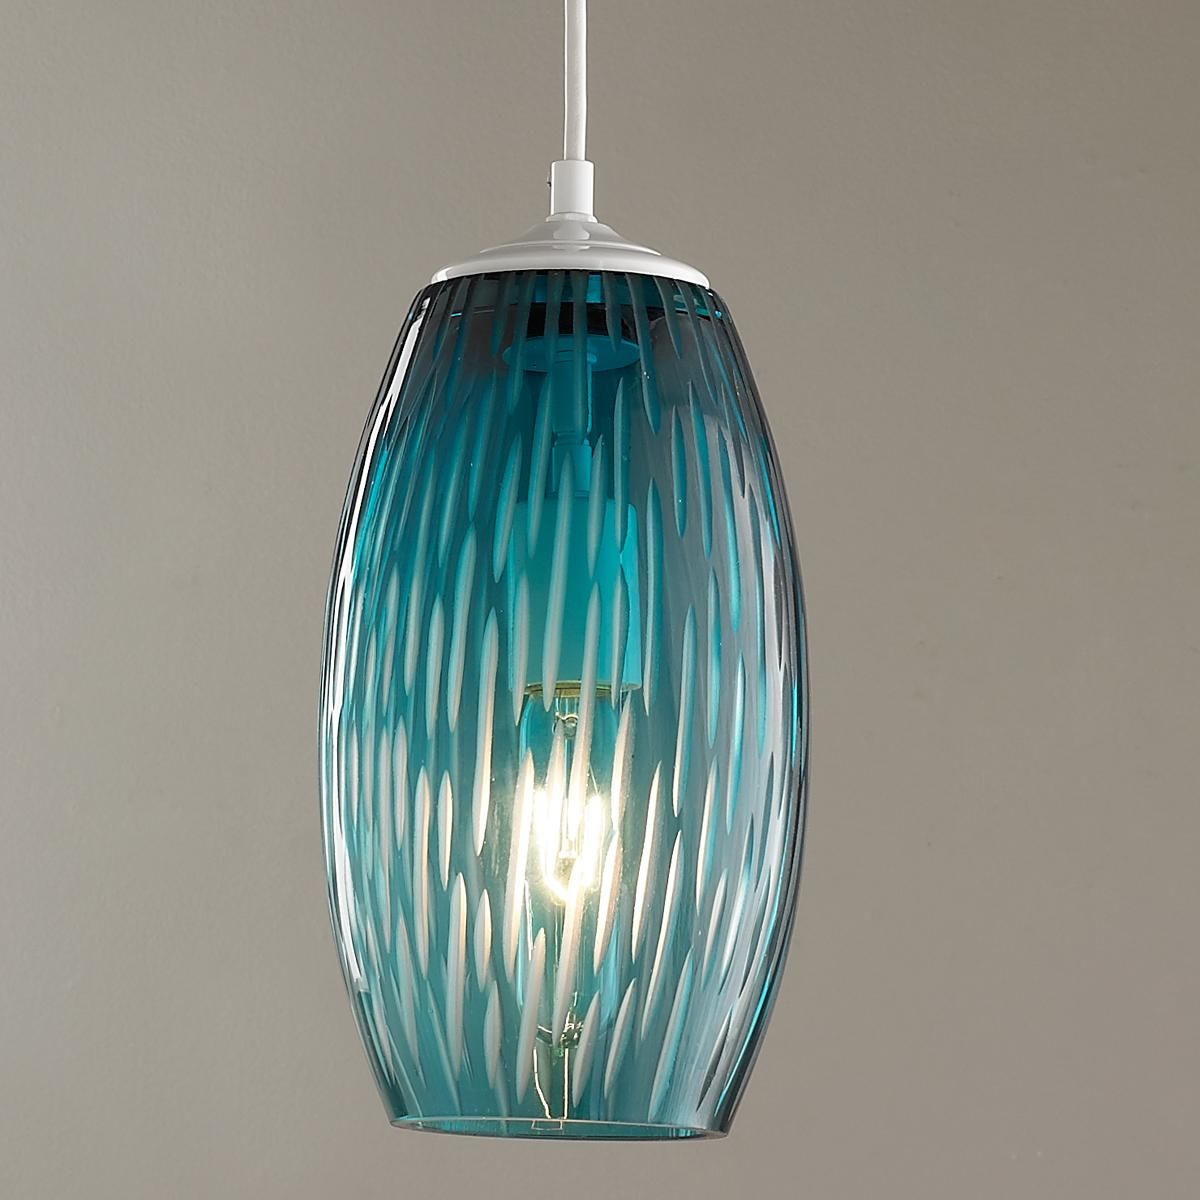 Etched Lines Glass Pendant Light Glass Pendant Light Blue Pendant Light Island Pendant Lights